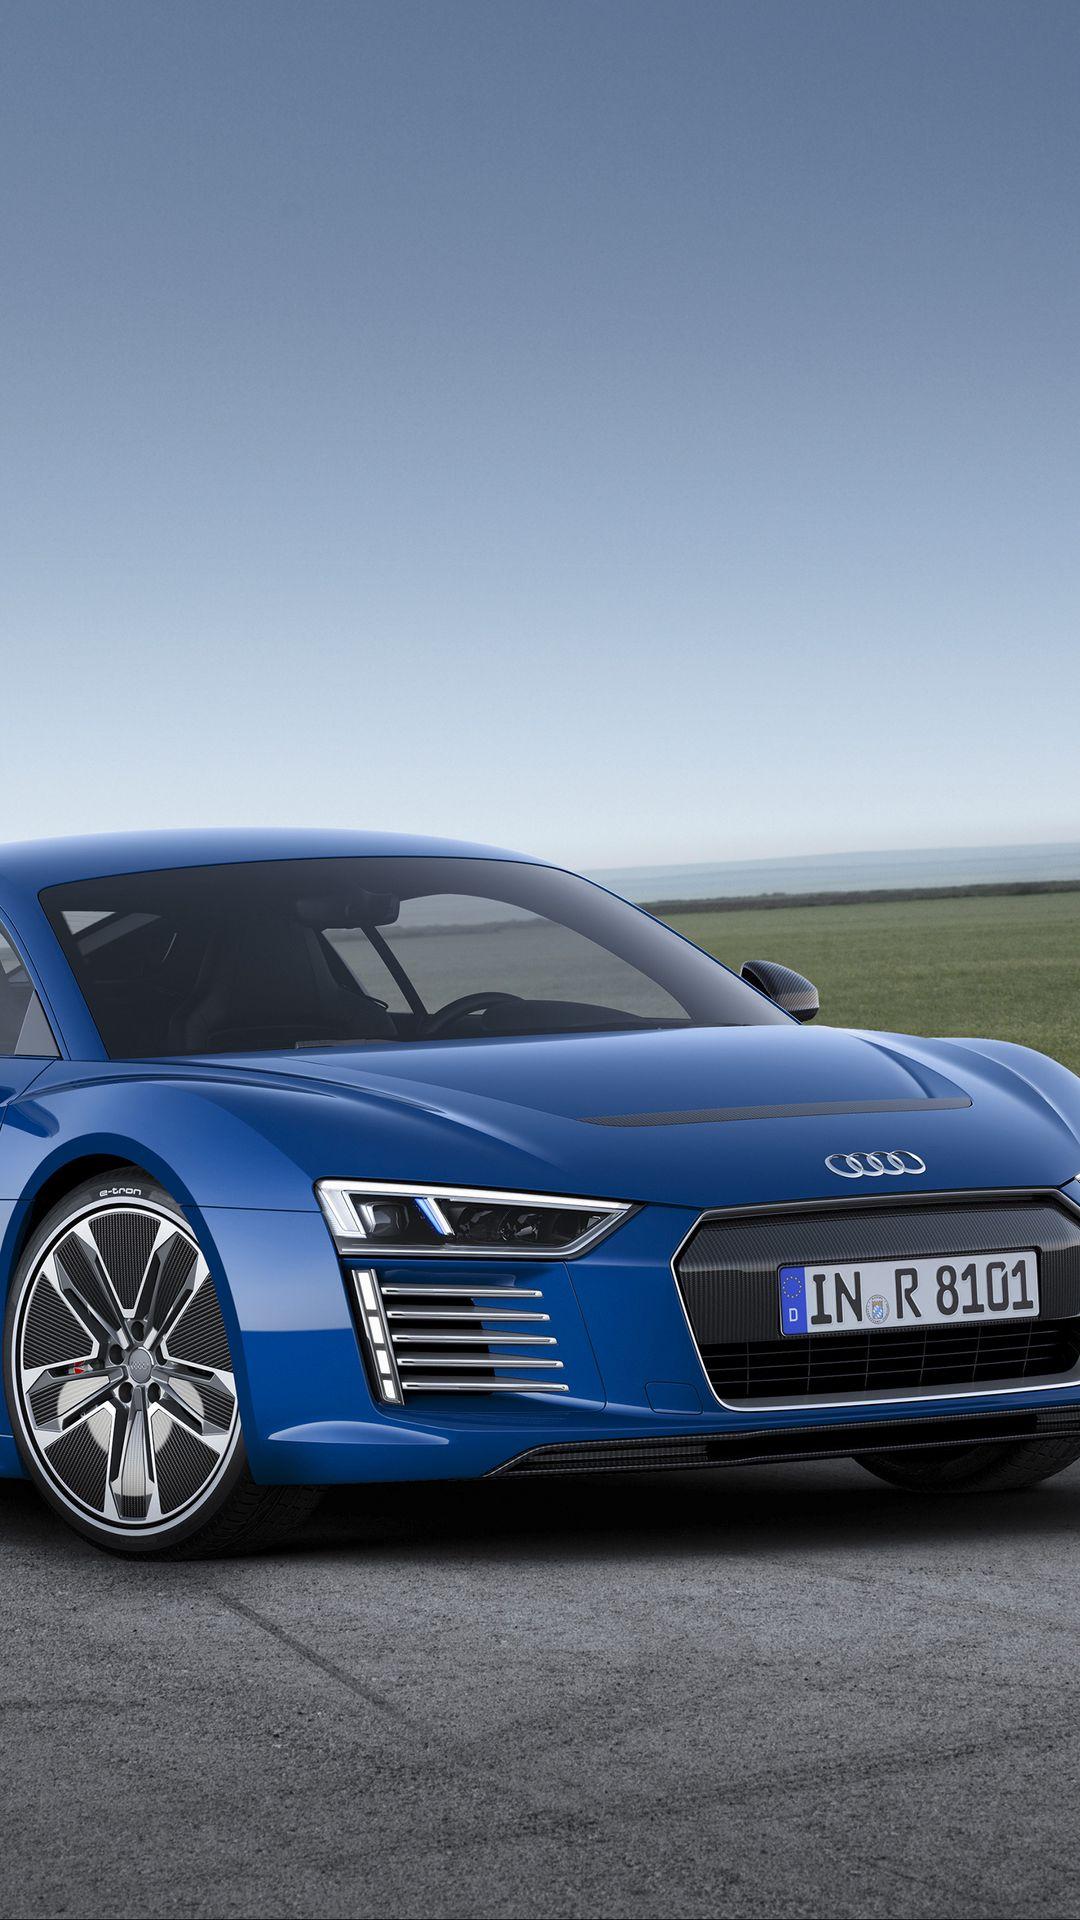 Audi R8 E Tron Wallpapers Free Download